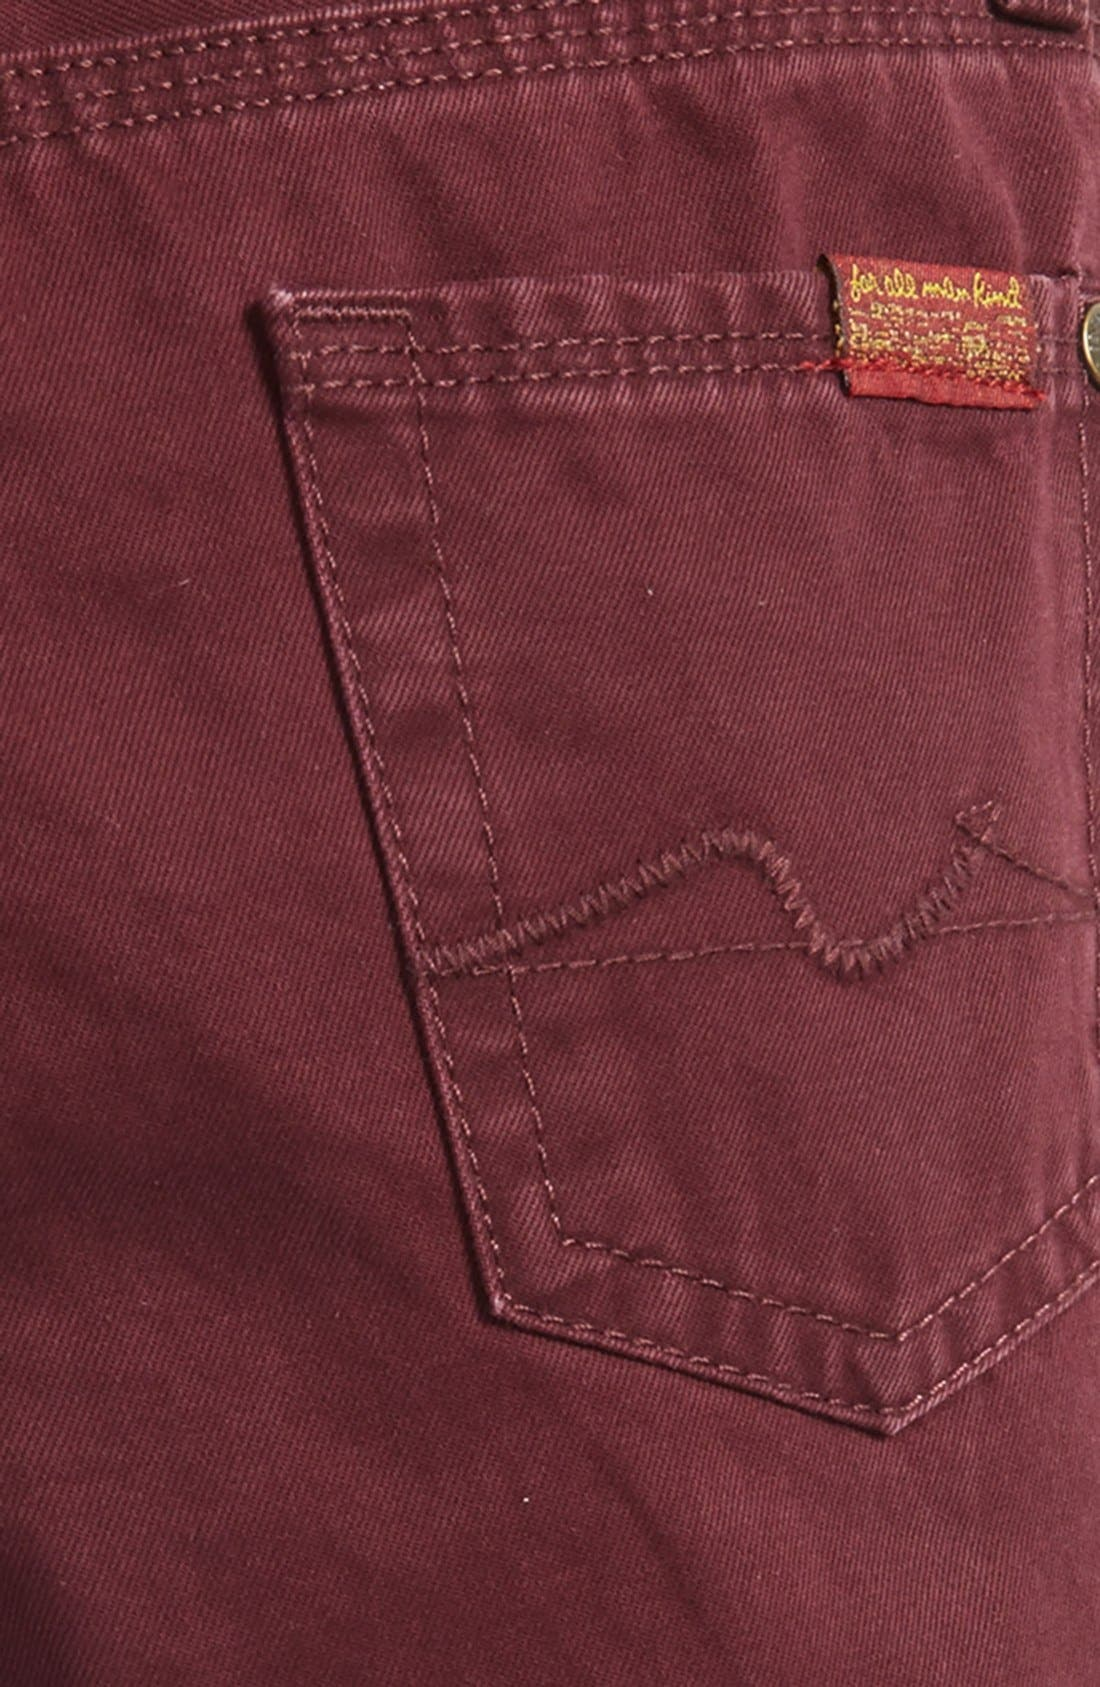 Alternate Image 3  - 7 For All Mankind® 'Slimmy' Slim Fit Jeans (Toddler Boys & Little Boys) (Online Only)